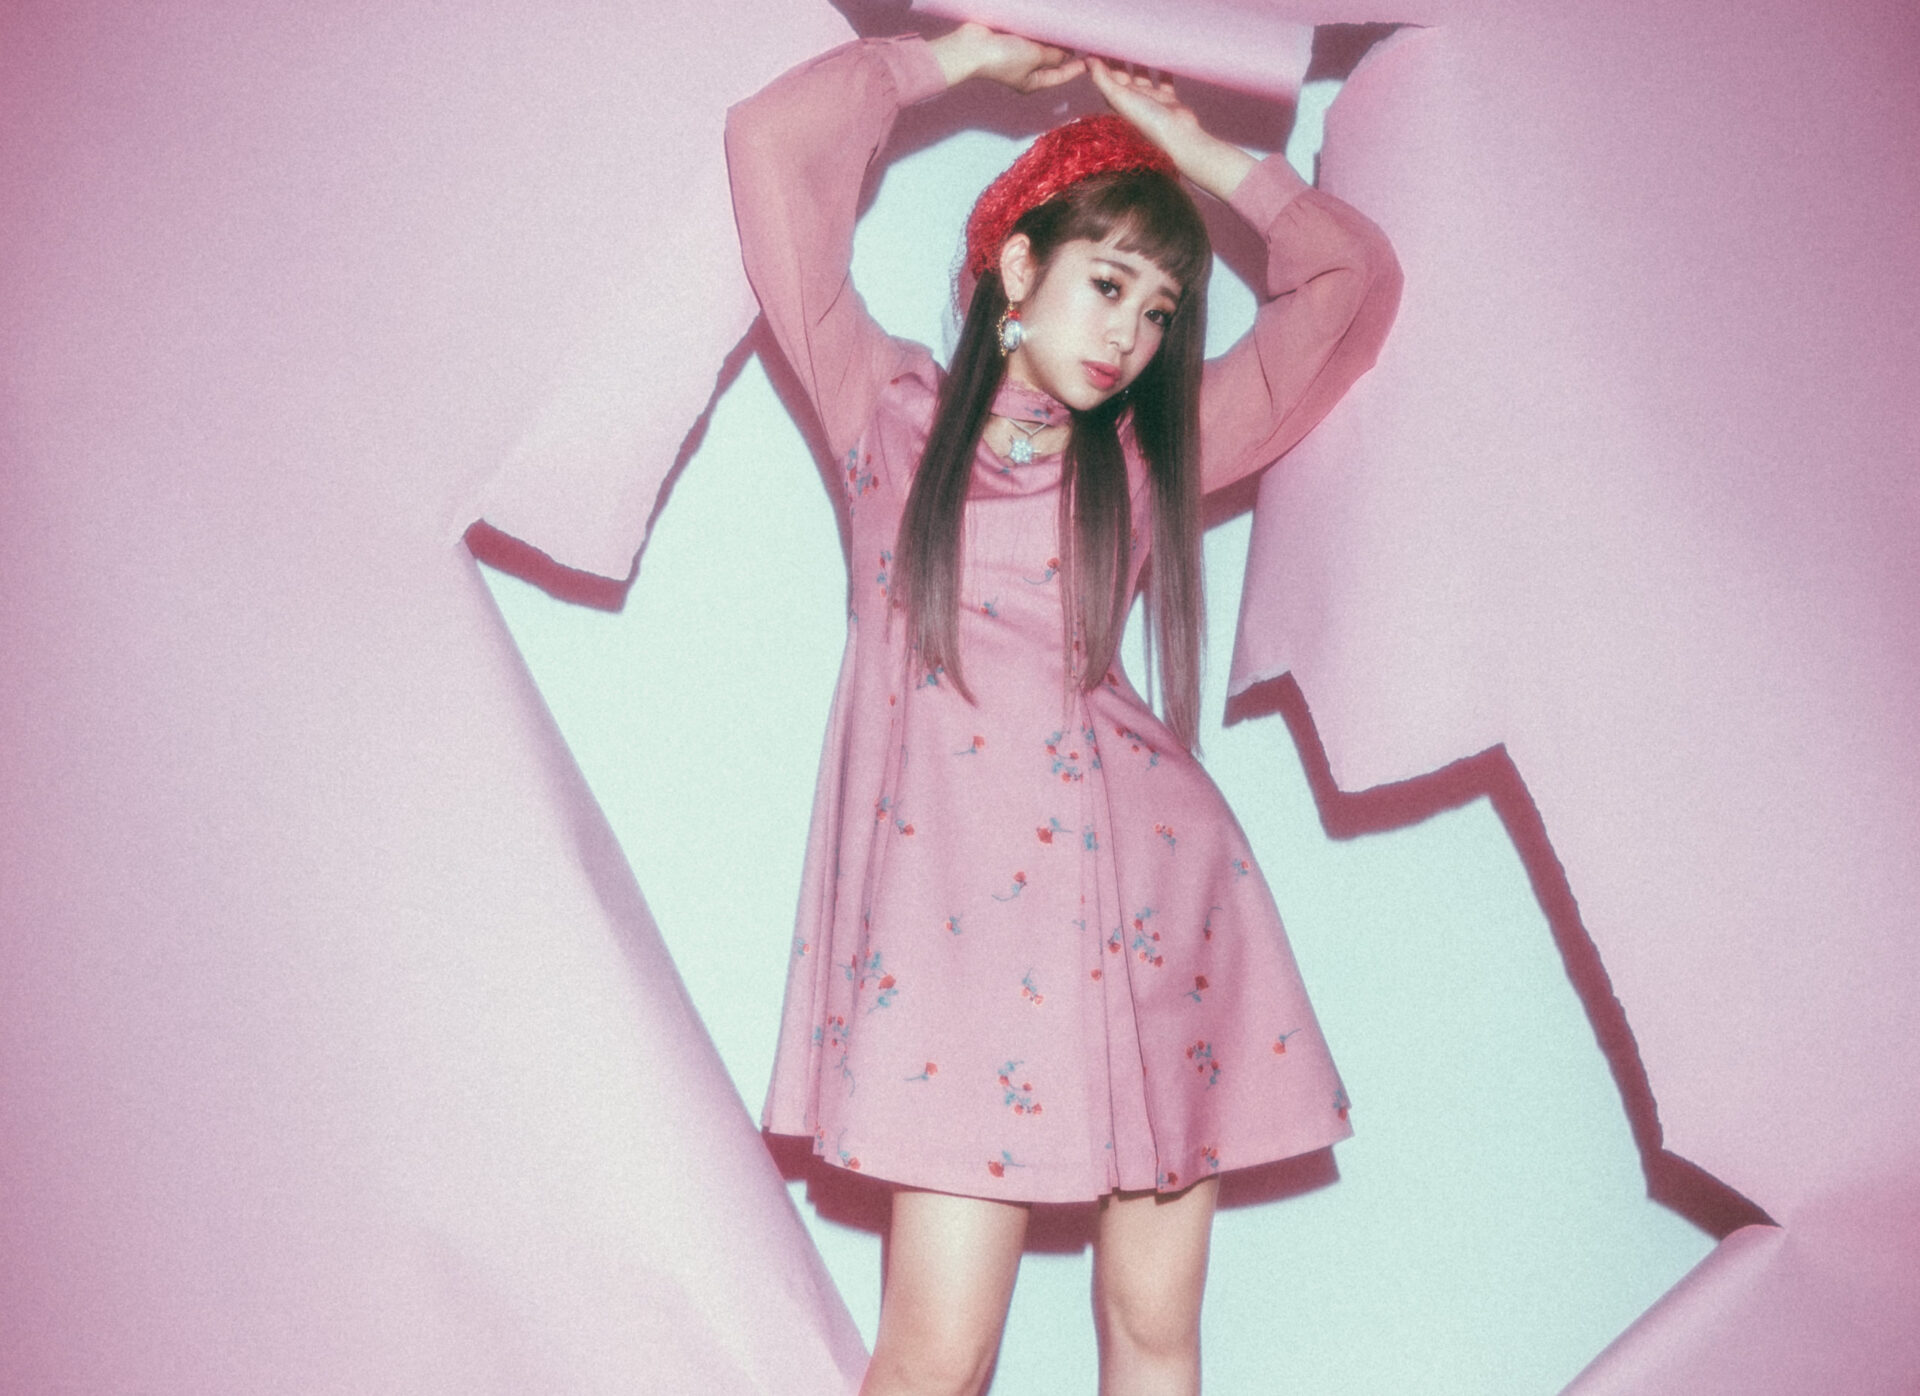 ihme 『issue1』  scene1 ピンクの世界と神谷愛梨/ソー・ワット?